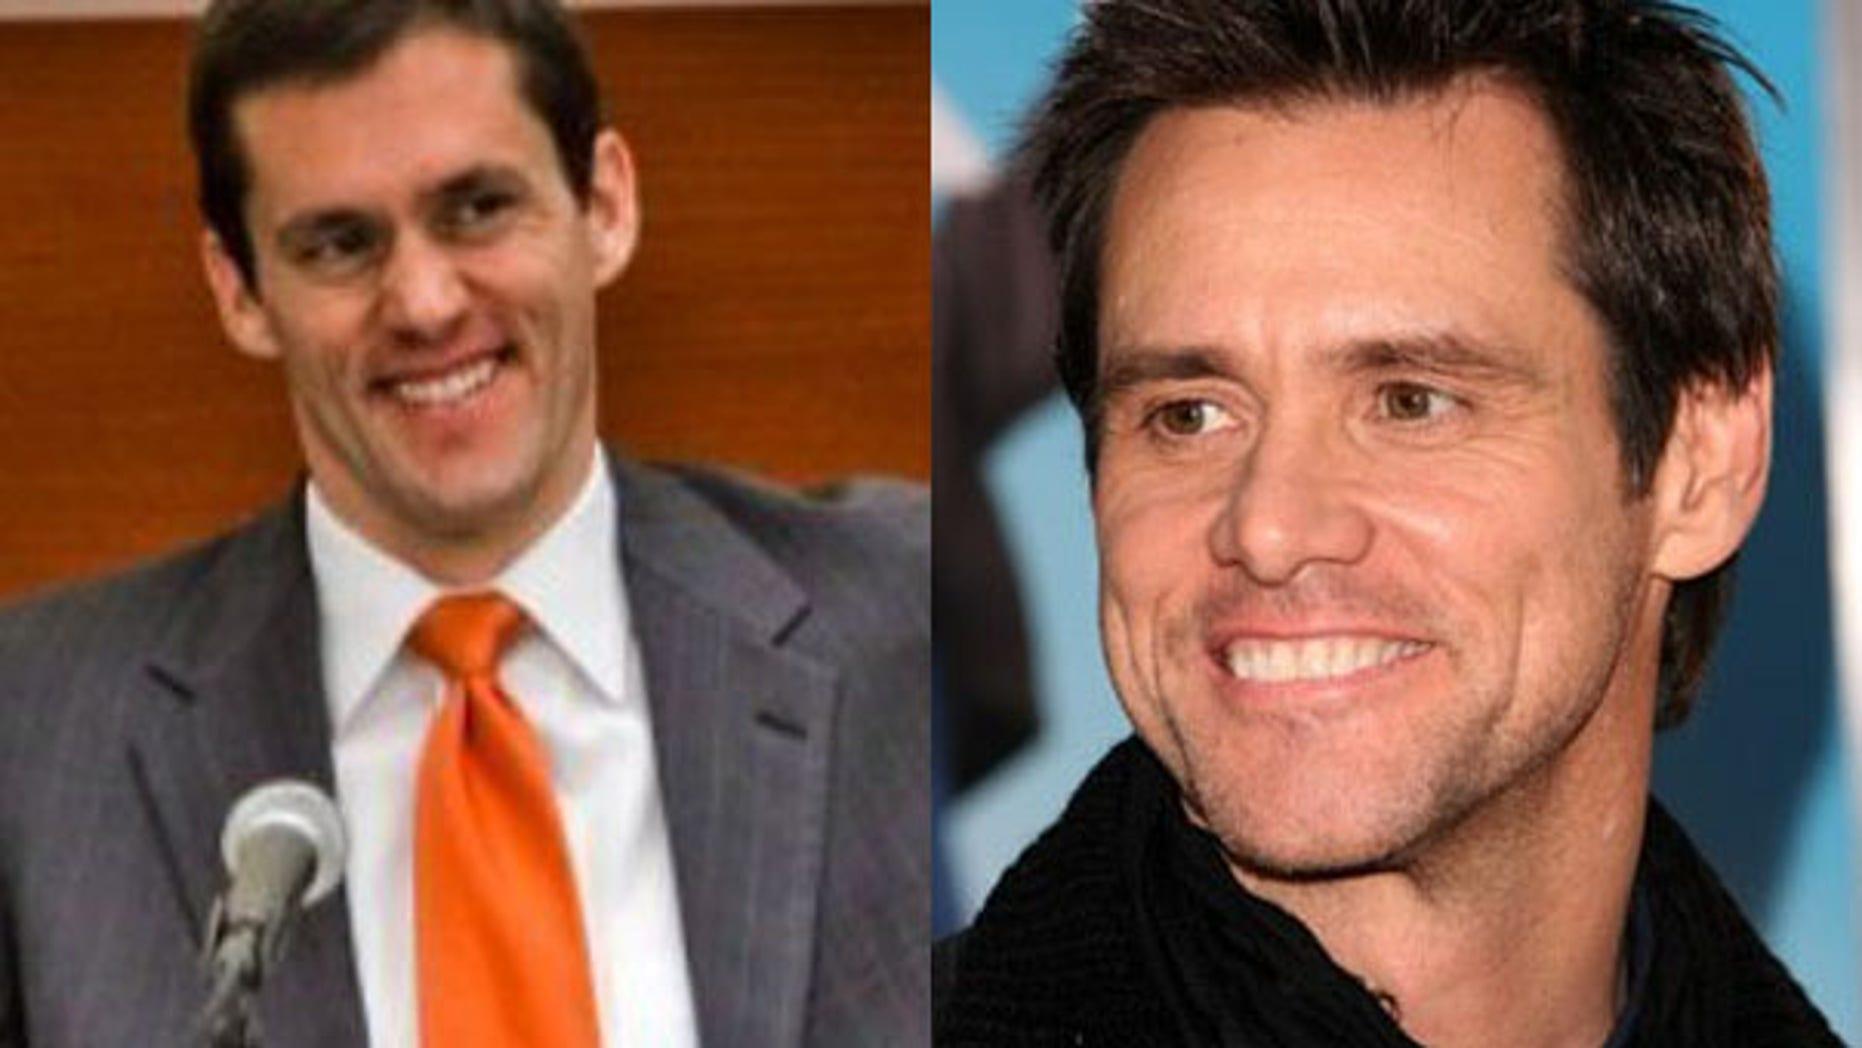 West Virginia Senator-designate Carte Goodwin, left, and actor-comedian Jim Carrey bear an uncanny resemblance.